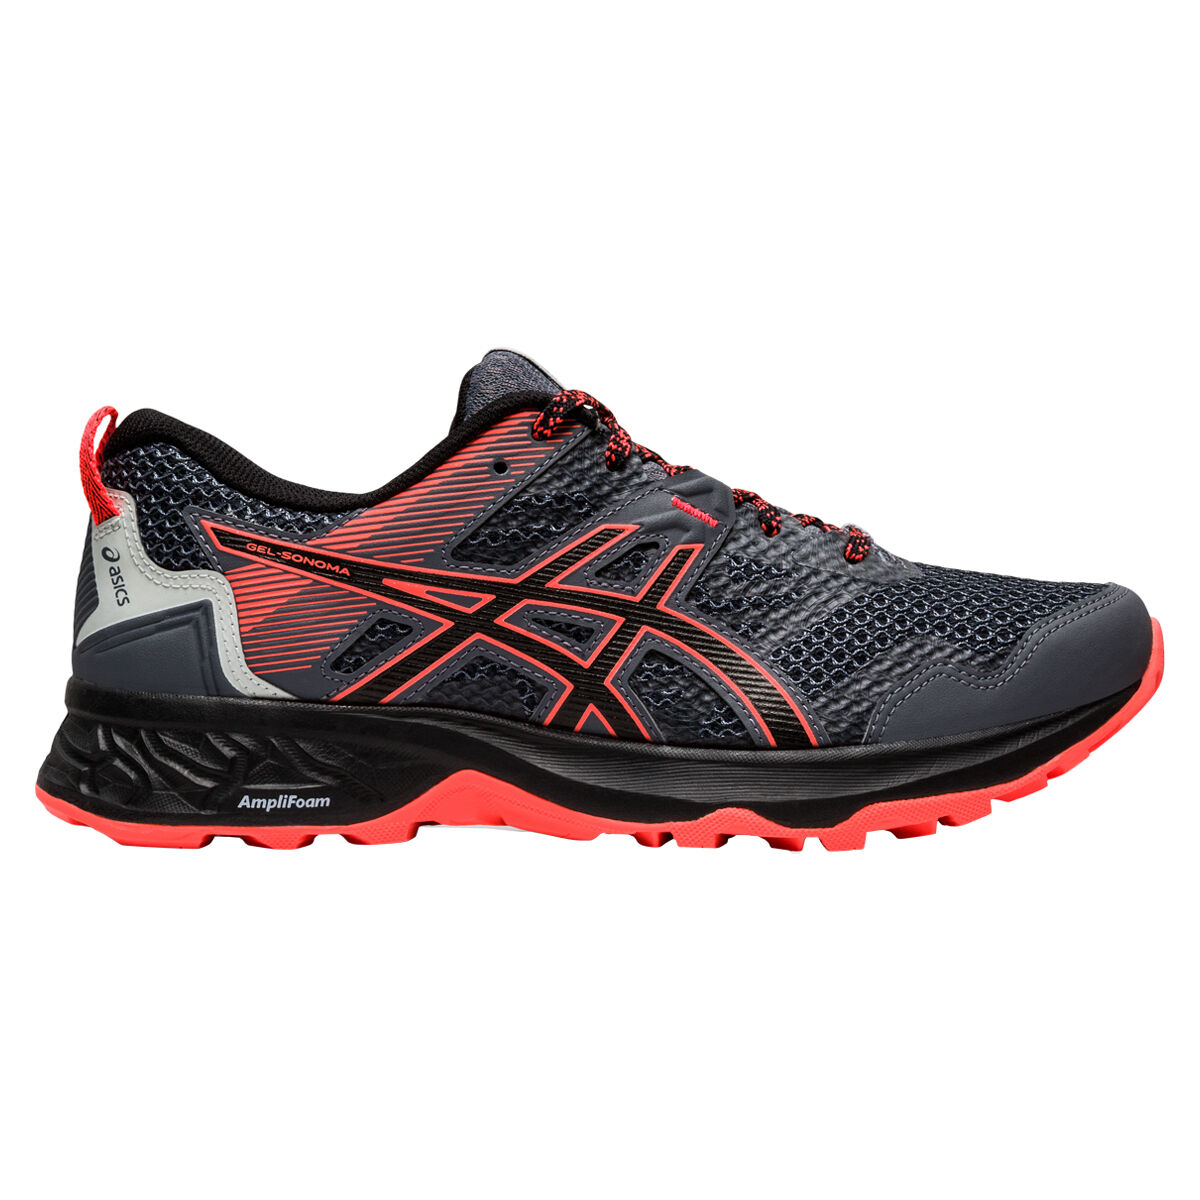 NWT Adidas Rockadia Trail Women's Running Shoe NWT